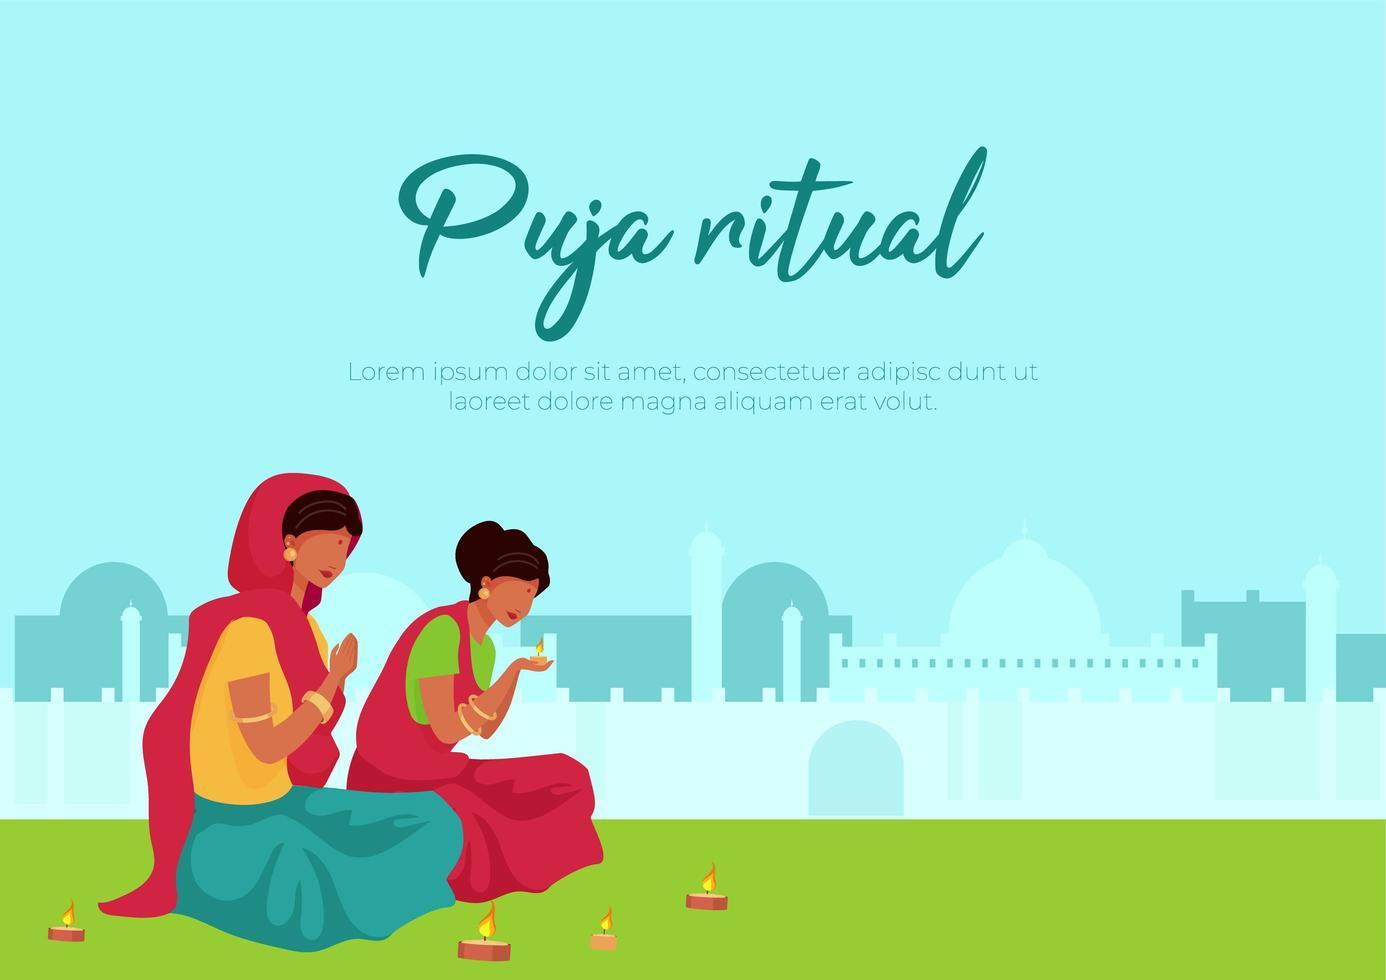 Puja ritual poster vector